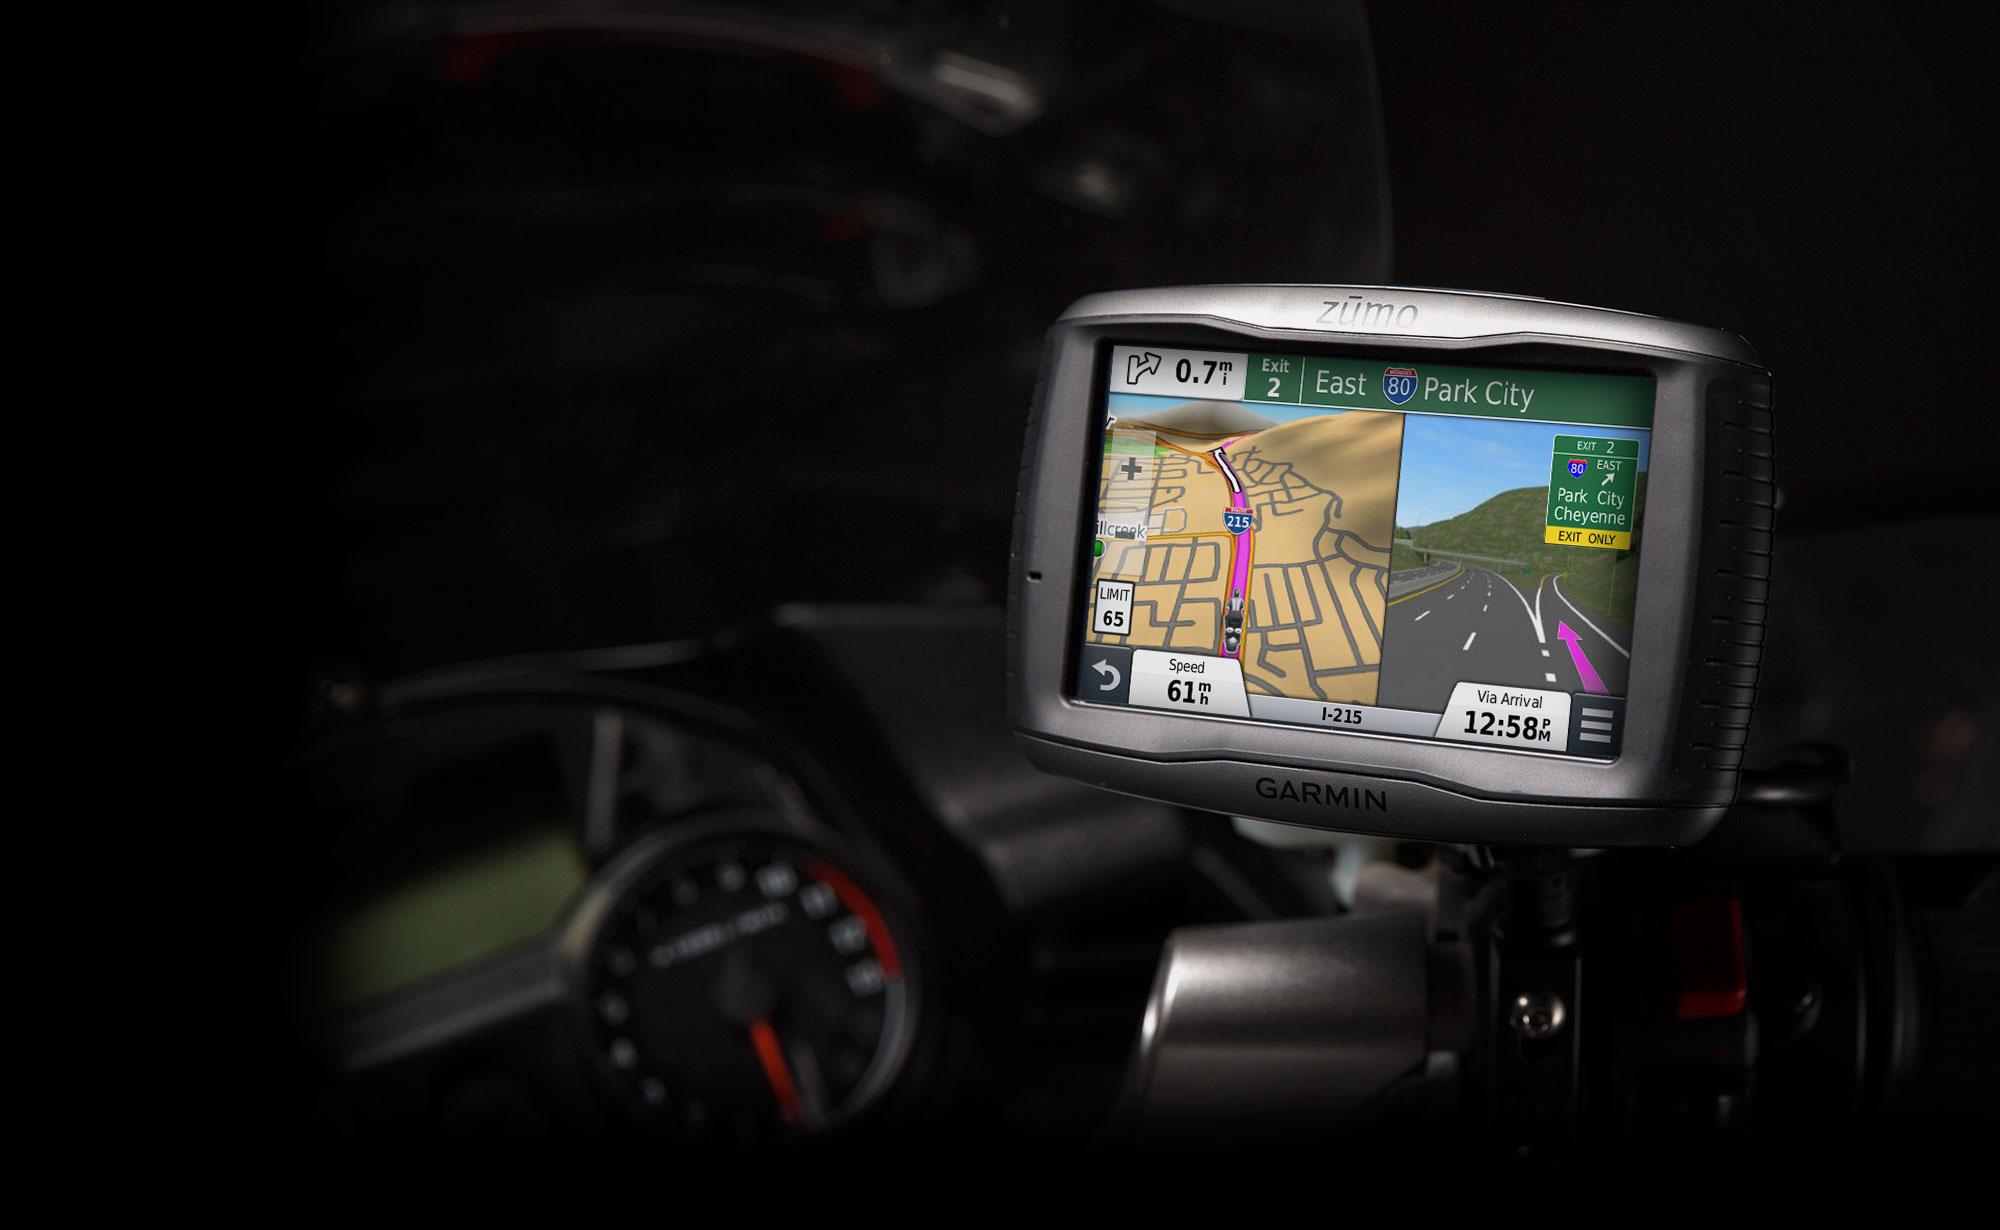 Garmin Reveals Zumo 590lm Premium Motorcycle Gps